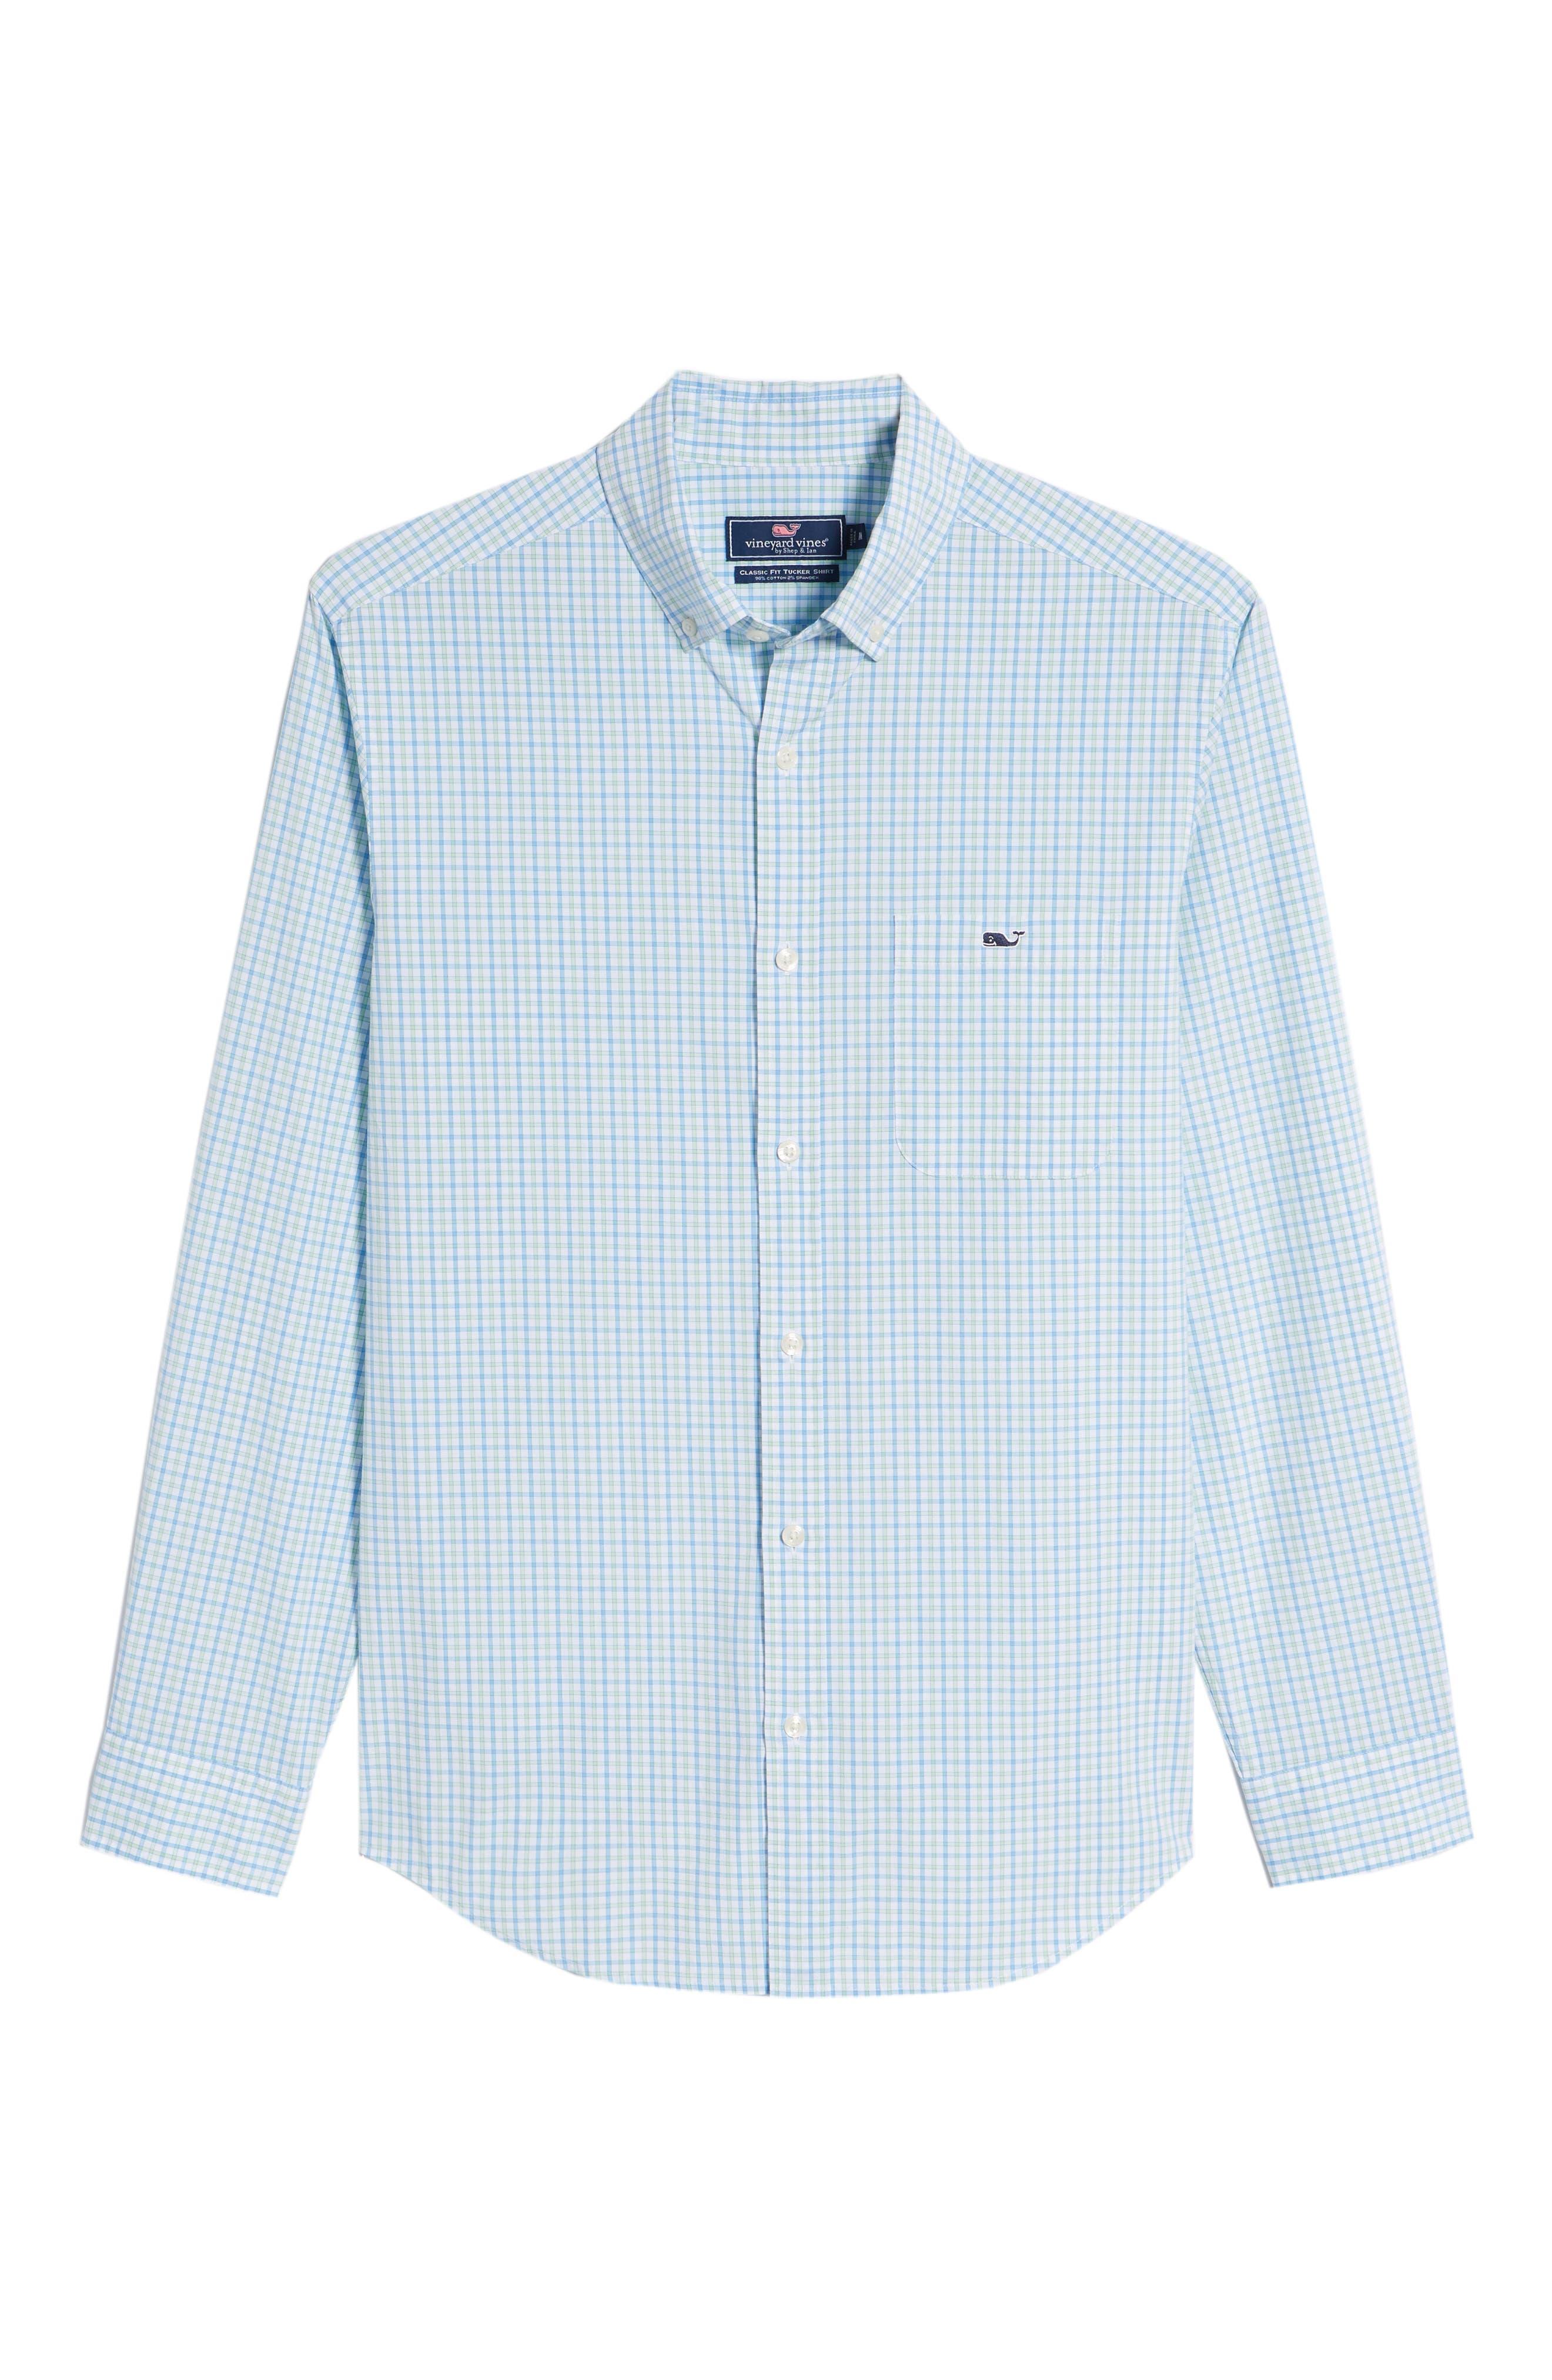 Clark Cove Tucker Classic Fit Check Sport Shirt,                             Alternate thumbnail 6, color,                             305